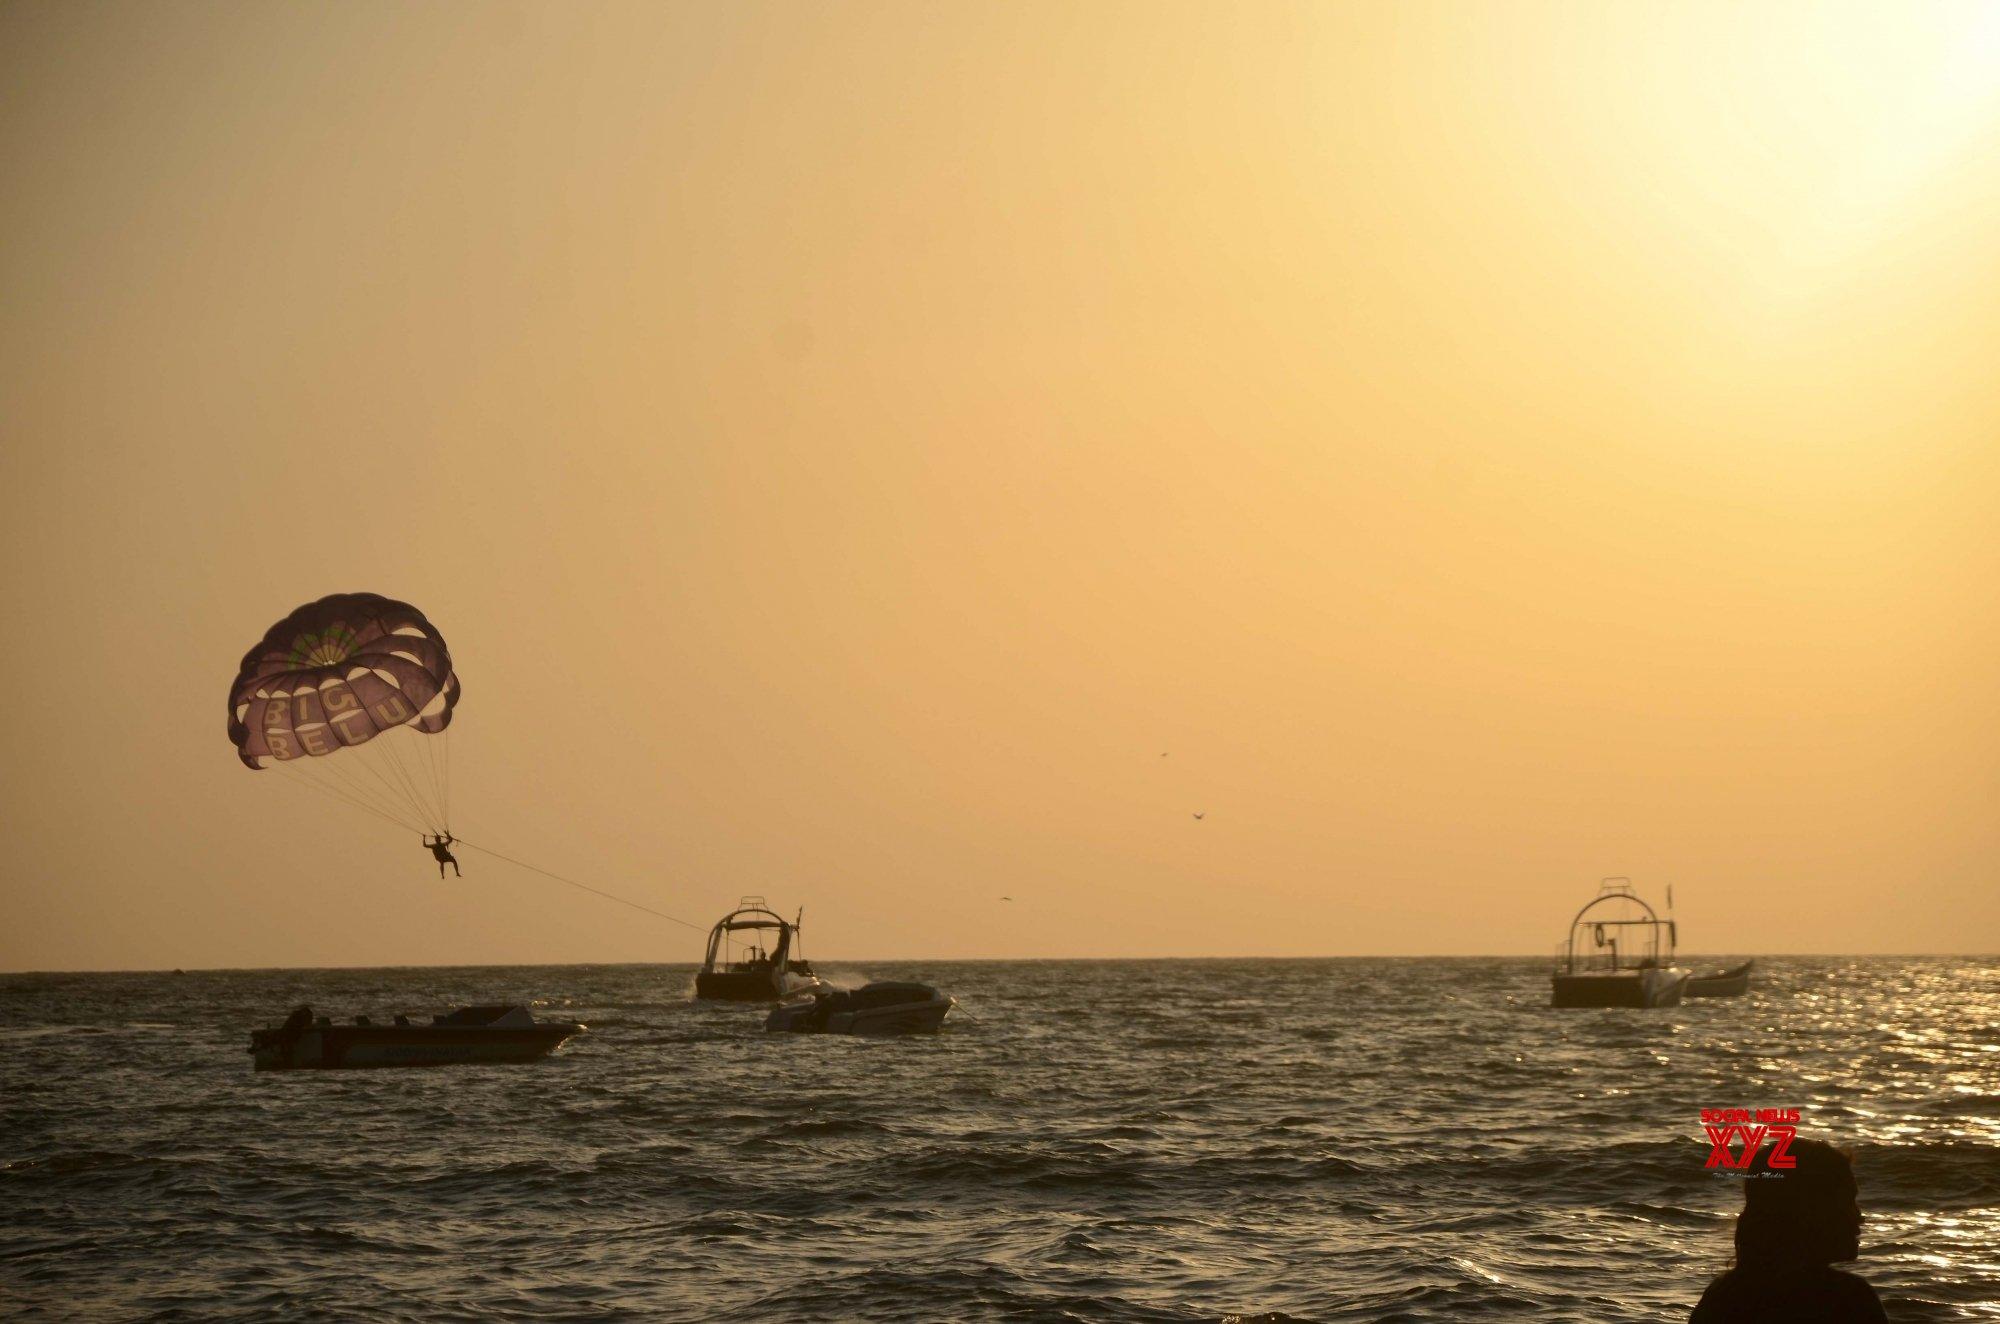 Malvan (Maharashtra): Paragliding #Gallery